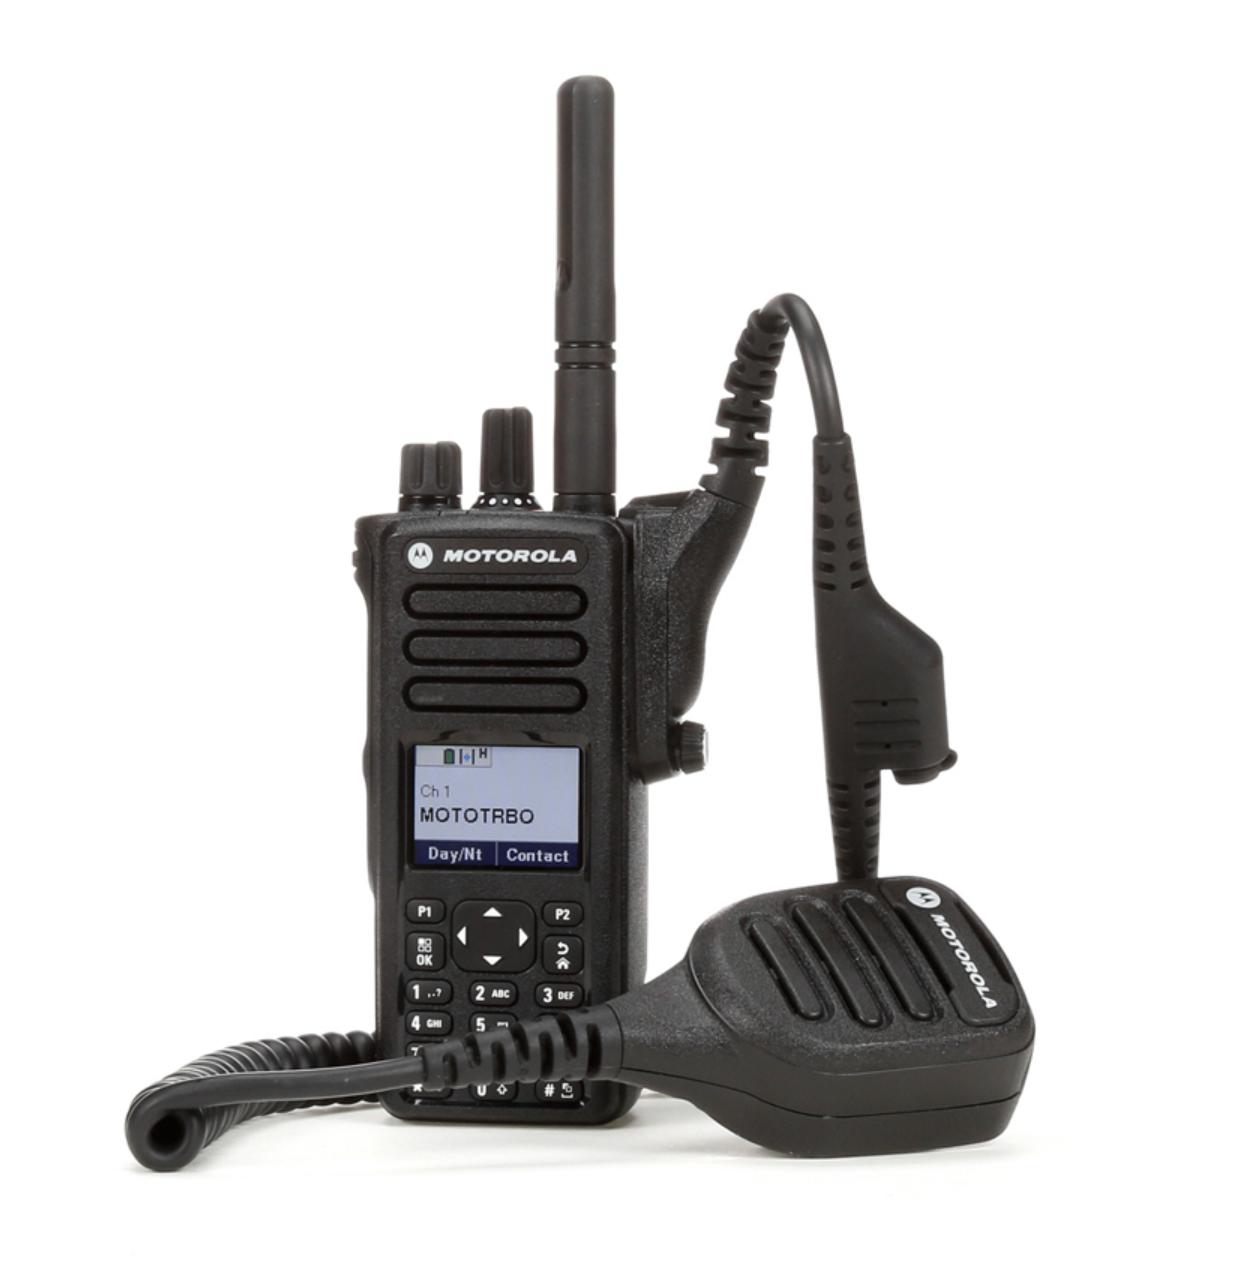 Motorola Xpr-7550 Portable Walkie Talkie With Gps Dmr Ip Connect Military  Standard - Buy Walkie Talkie With Bluetooth Headset,Walkie Talkie